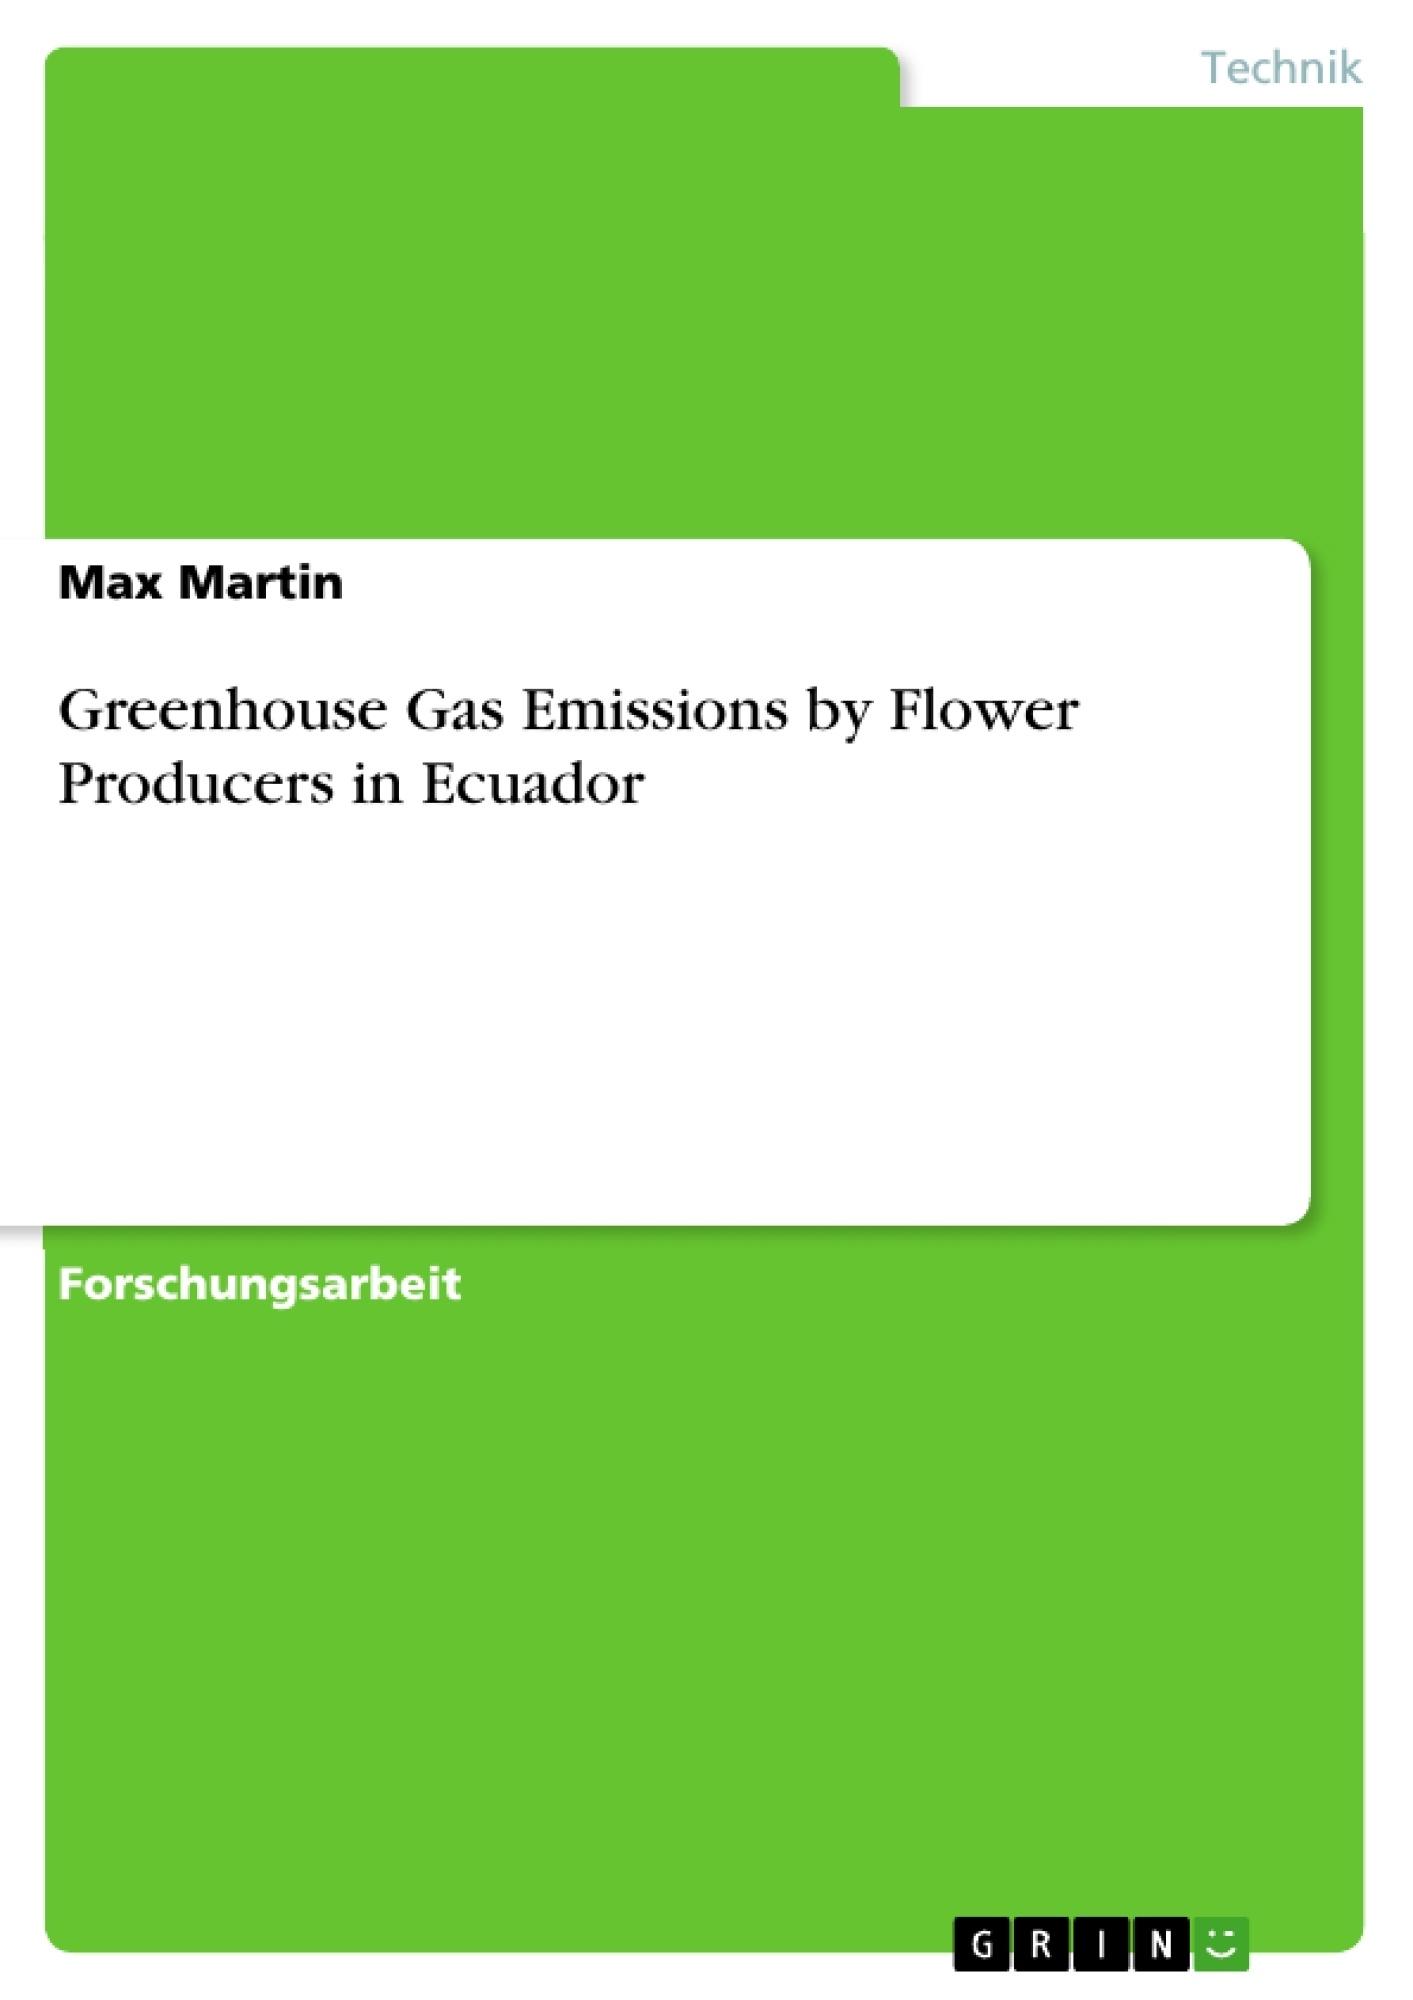 Titel: Greenhouse Gas Emissions by Flower Producers in Ecuador